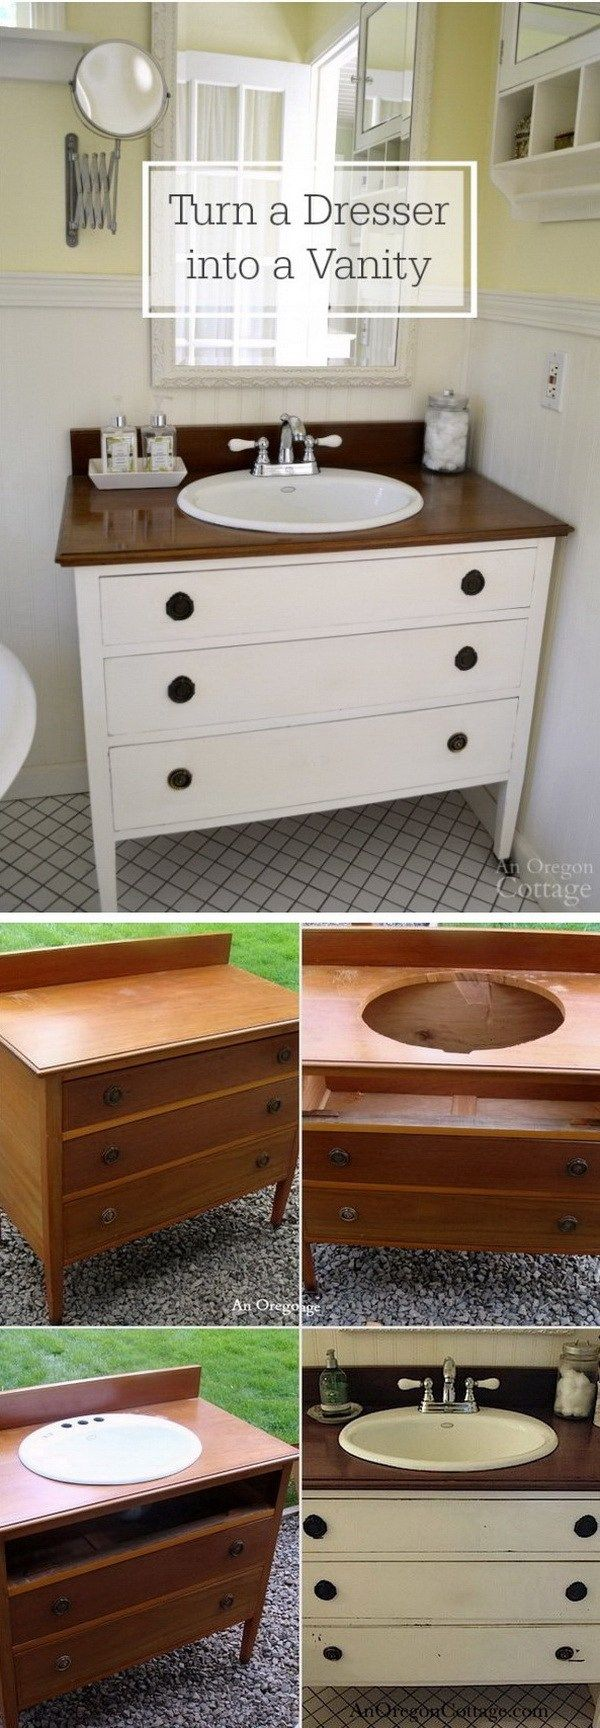 DIY Bathroom Vanity with Drawers for Storage.                                                                                                                                                                                 More